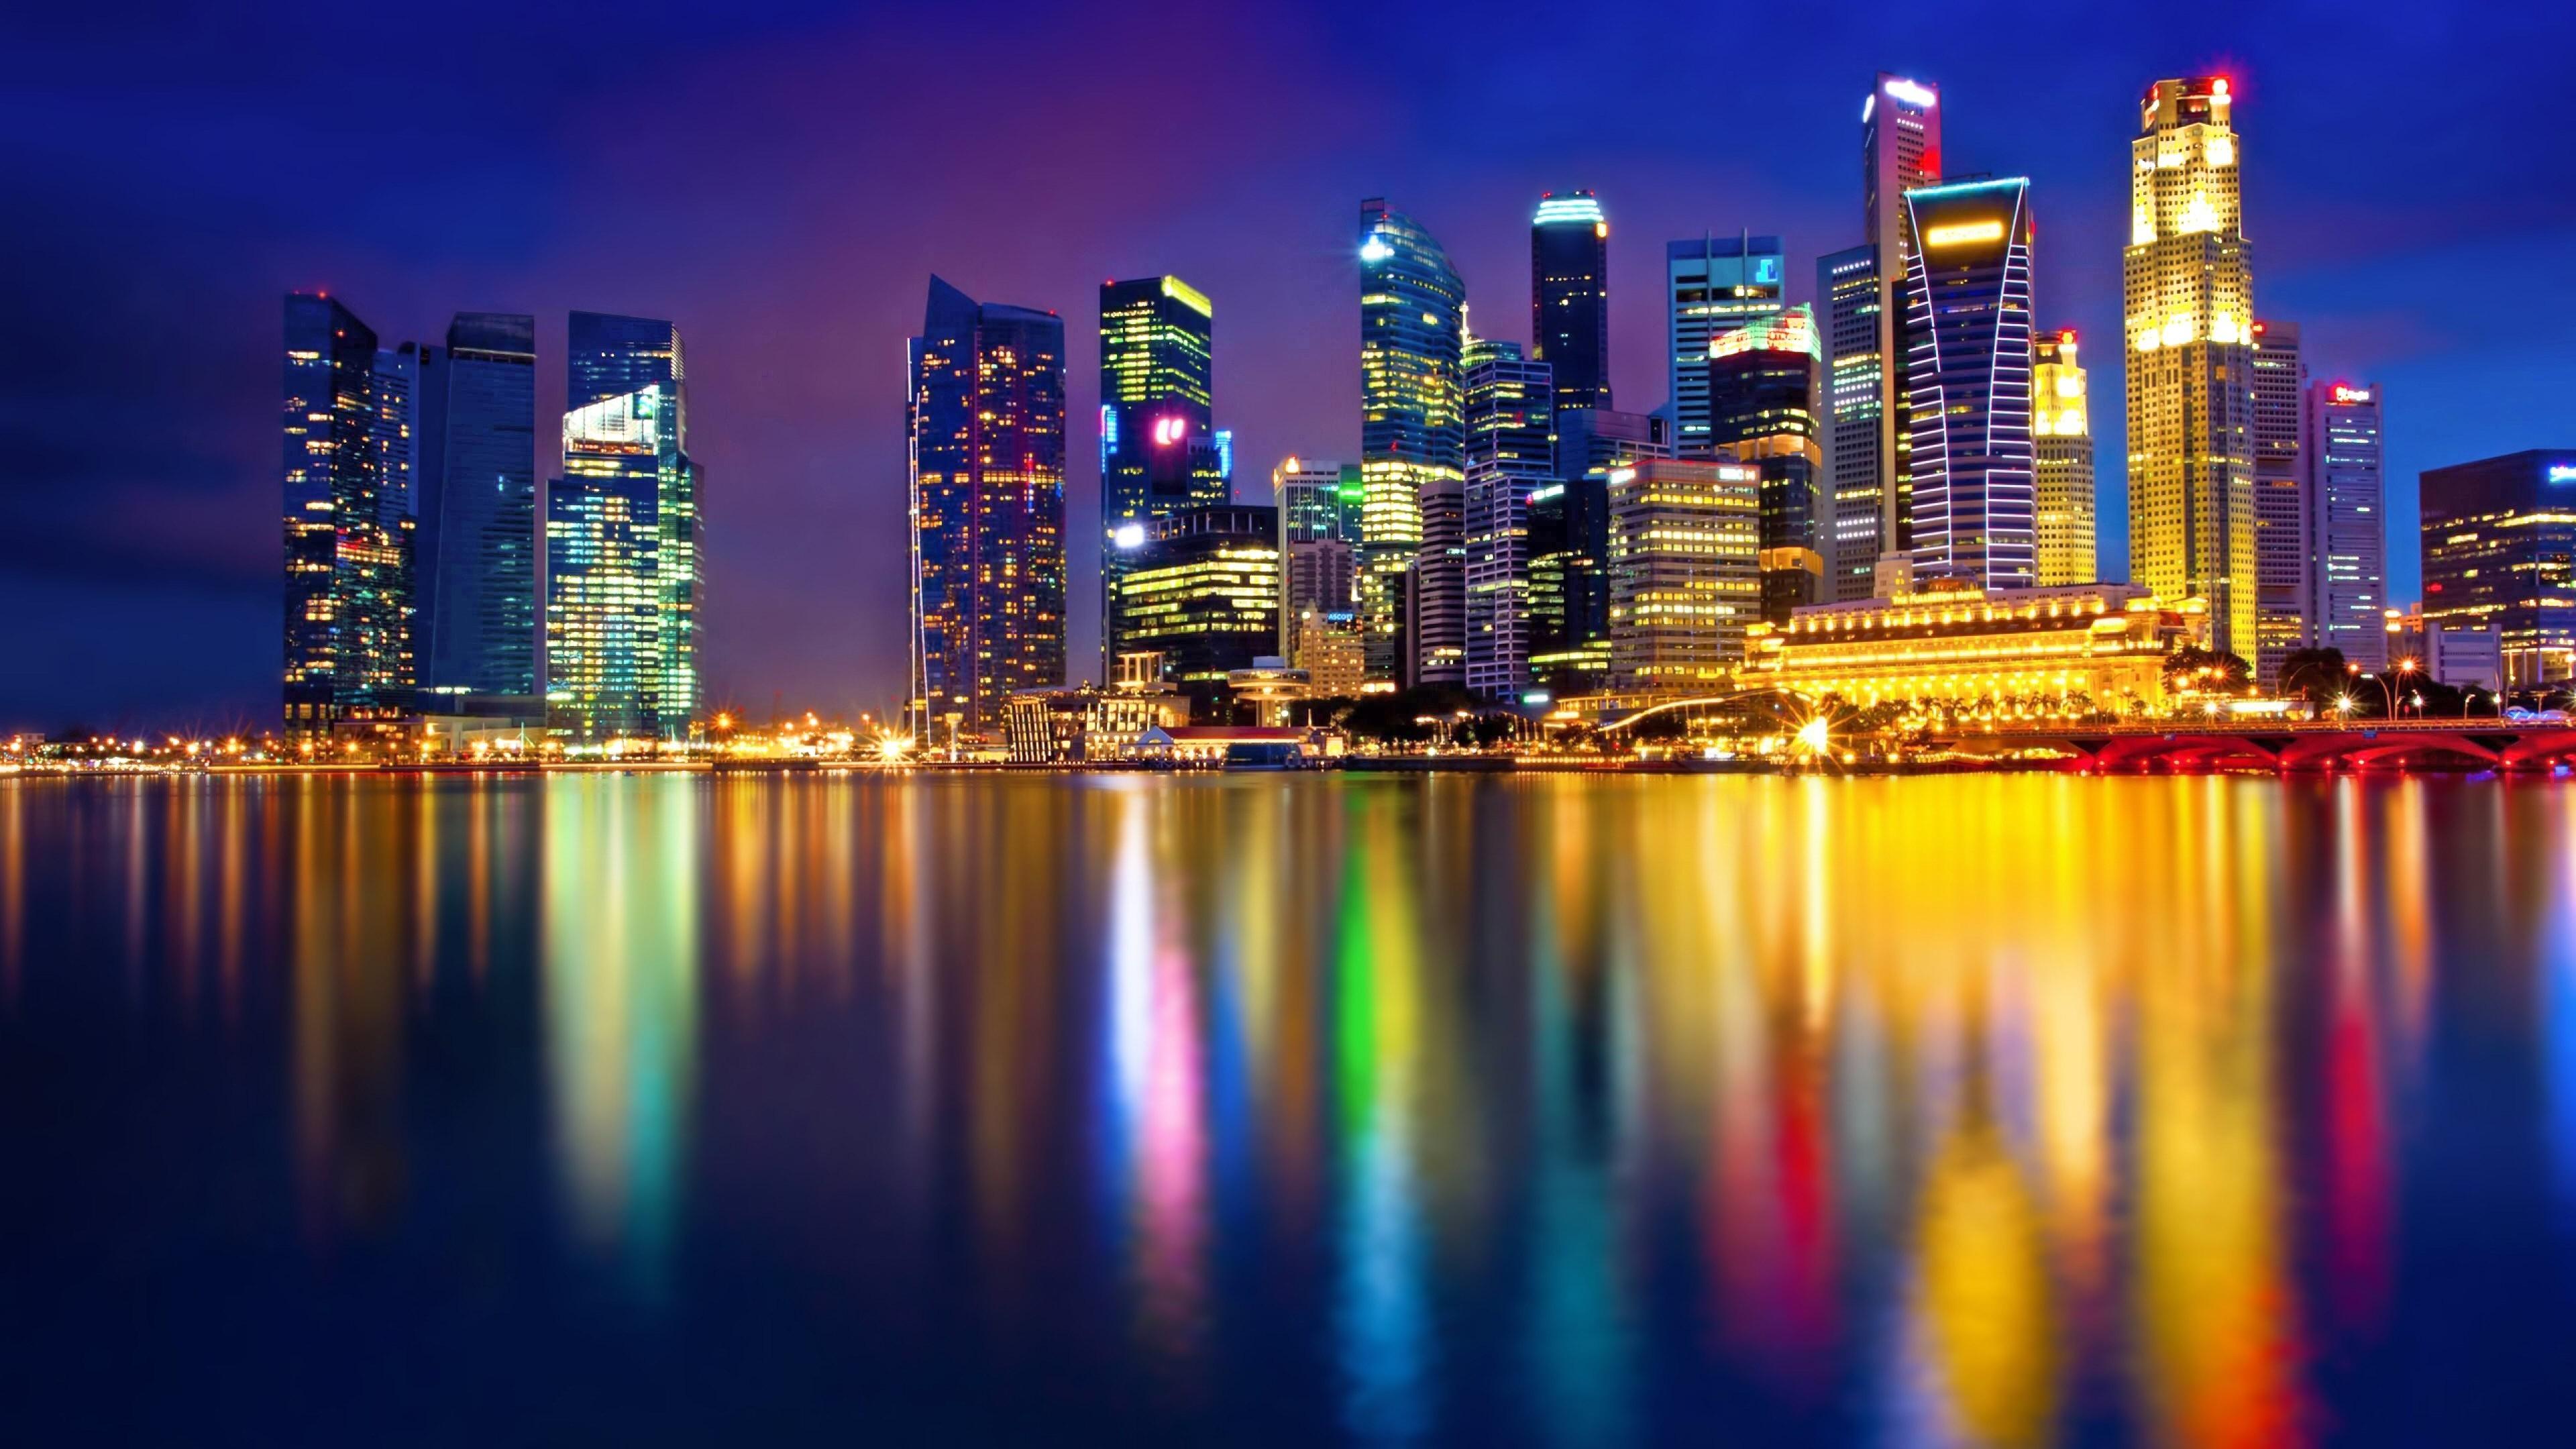 singapore cityscape 1538069092 - Singapore Cityscape - world wallpapers, singapore wallpapers, city wallpapers, beautiful places wallpapers